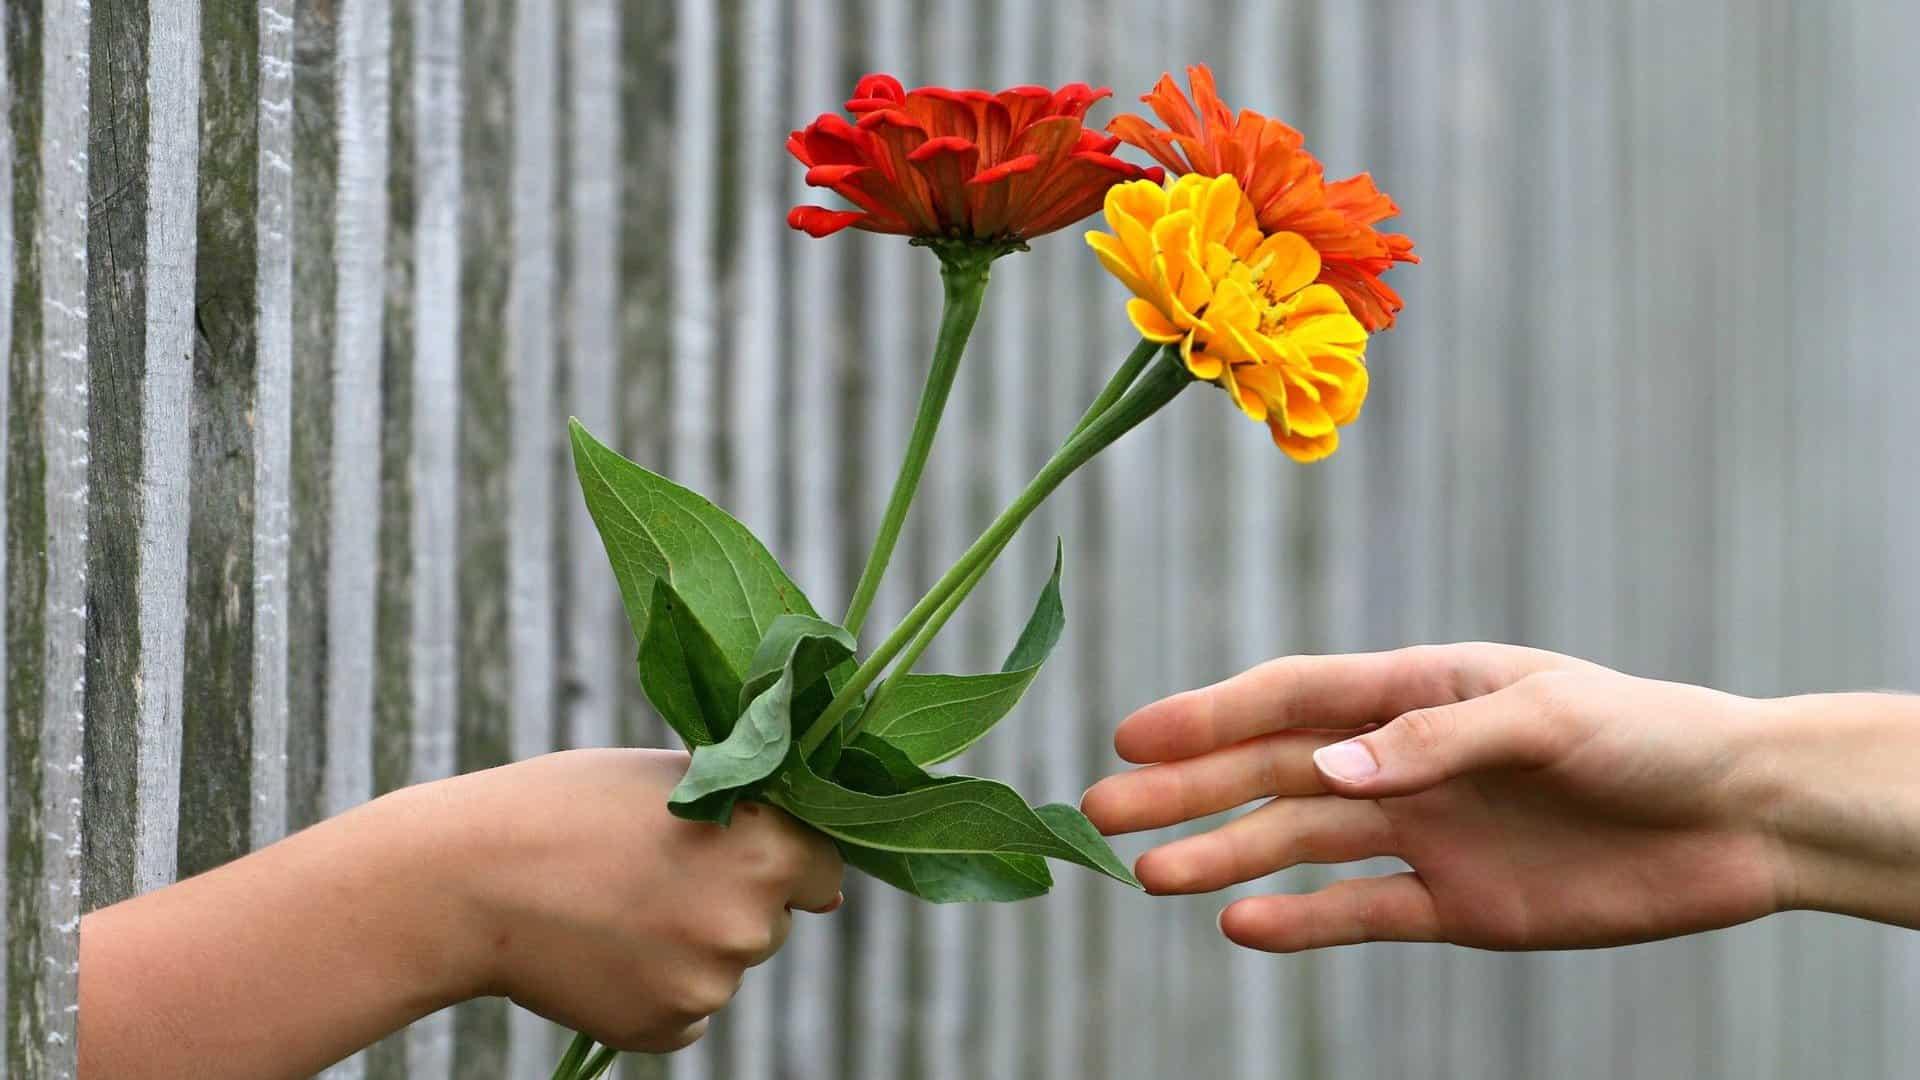 Sharing a Kindness